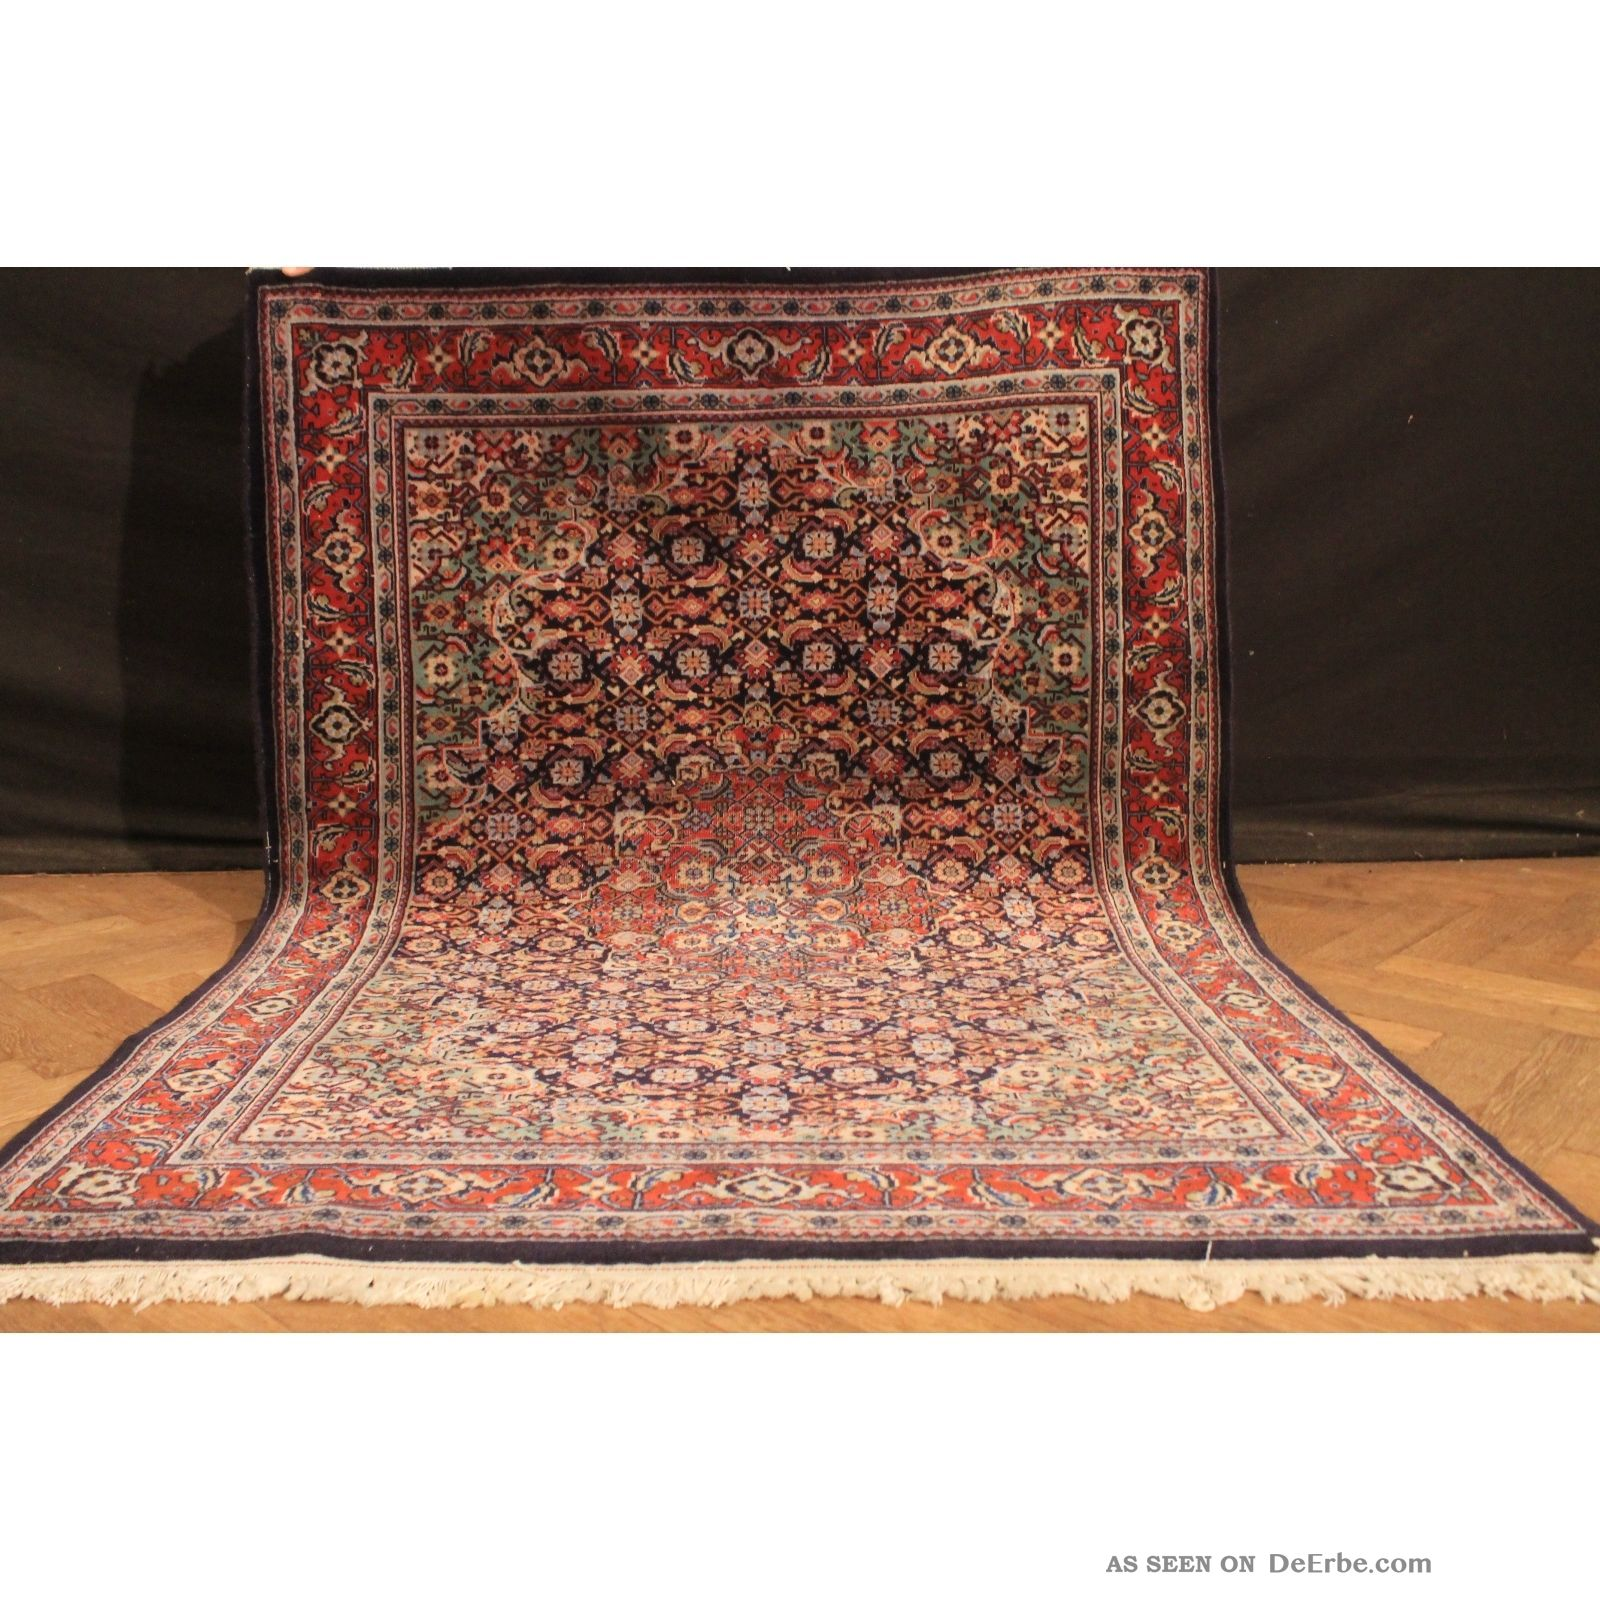 Fein Handgeknüpft Perser Blumen Palast Teppich Herati Carpet Tappeto 175x127cm Teppiche & Flachgewebe Bild